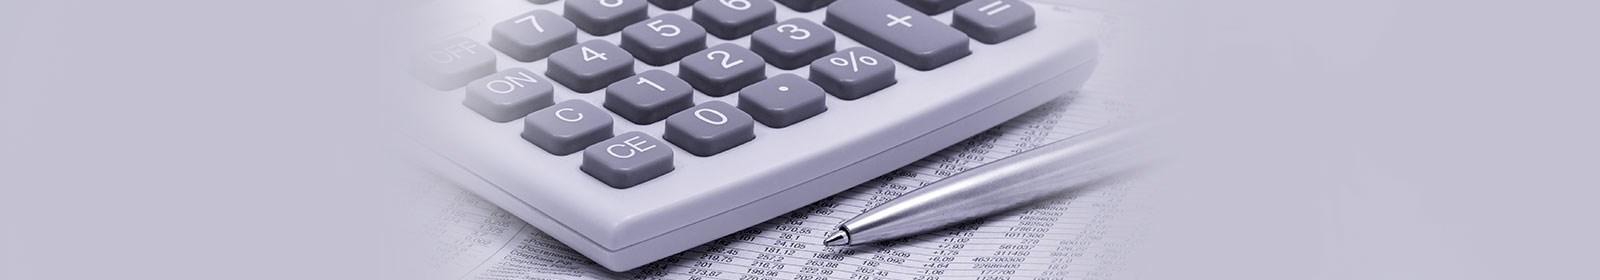 Municipal rates evaluations: FAQs